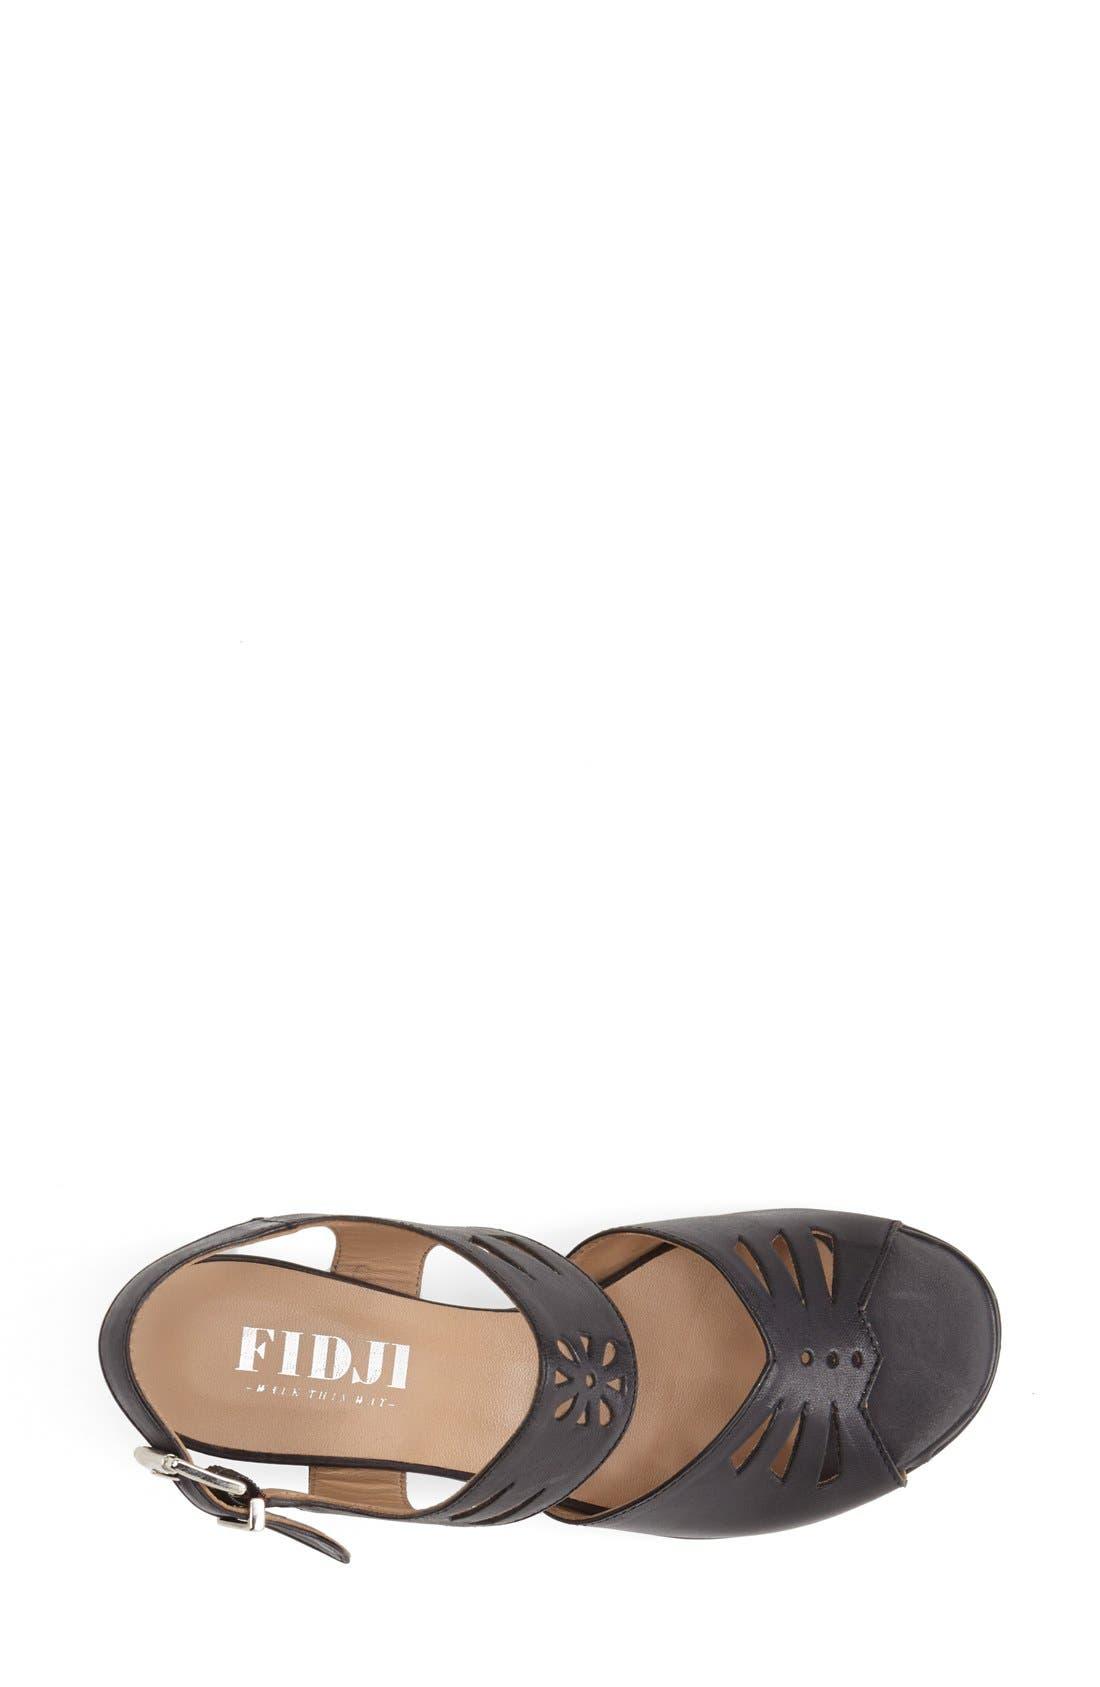 'V112' Perforated Leather Sandal,                             Alternate thumbnail 3, color,                             Black